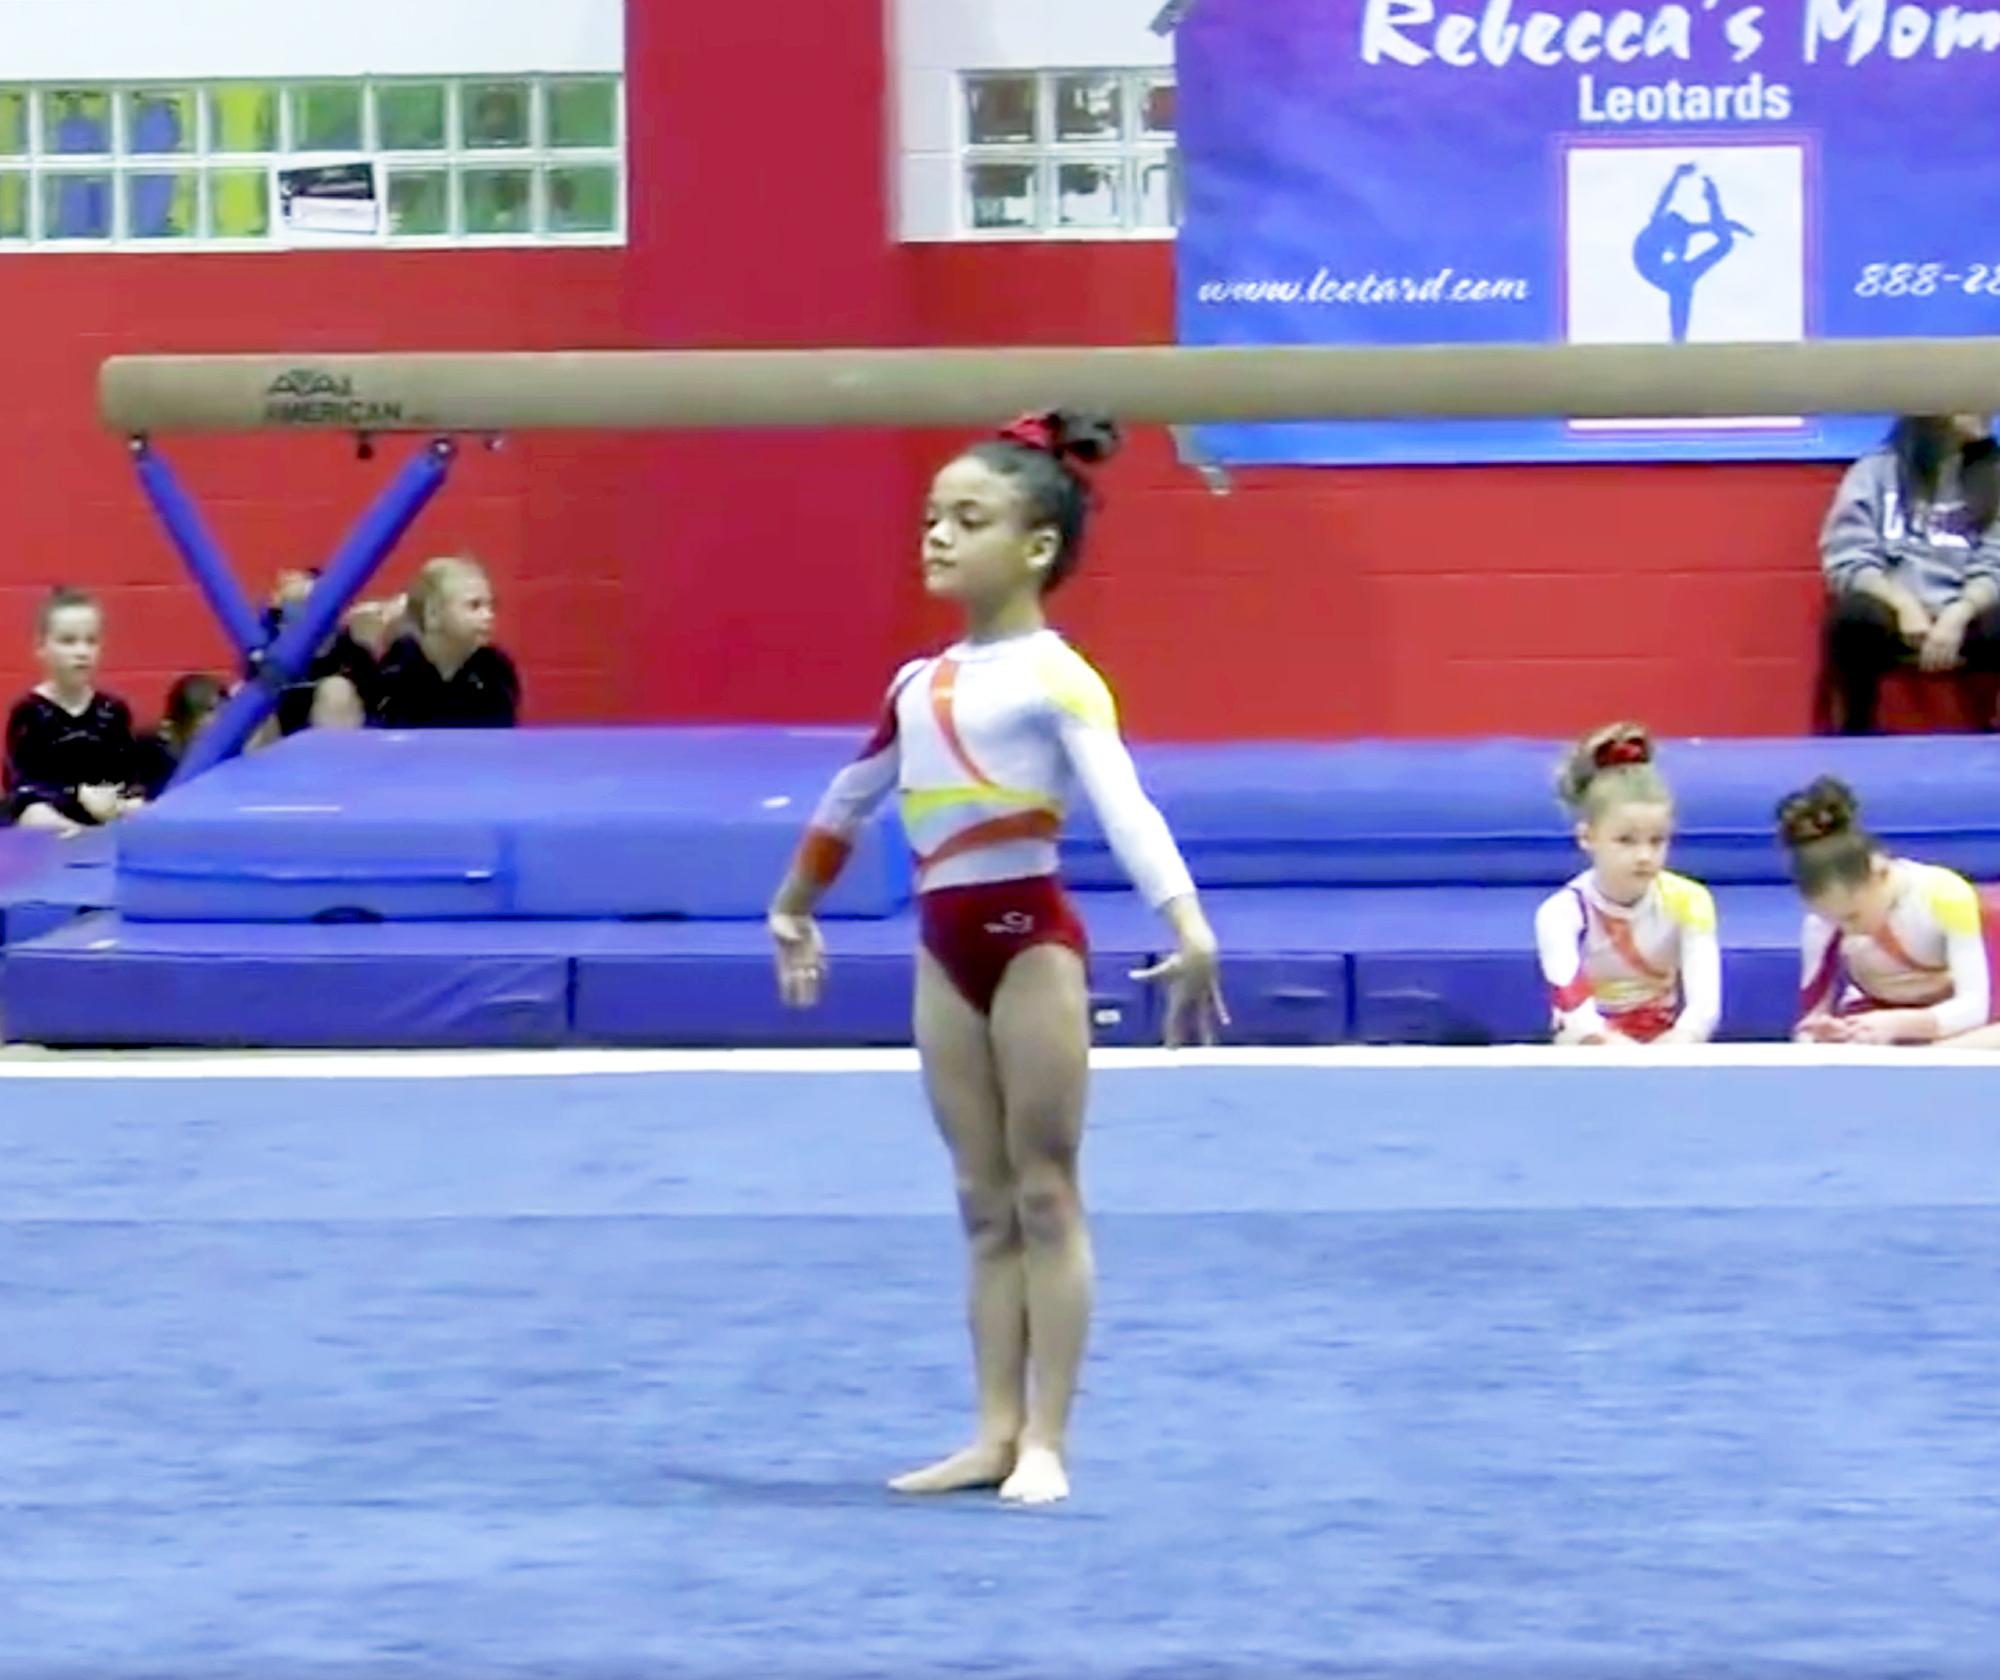 Extra small teen naked gymnast